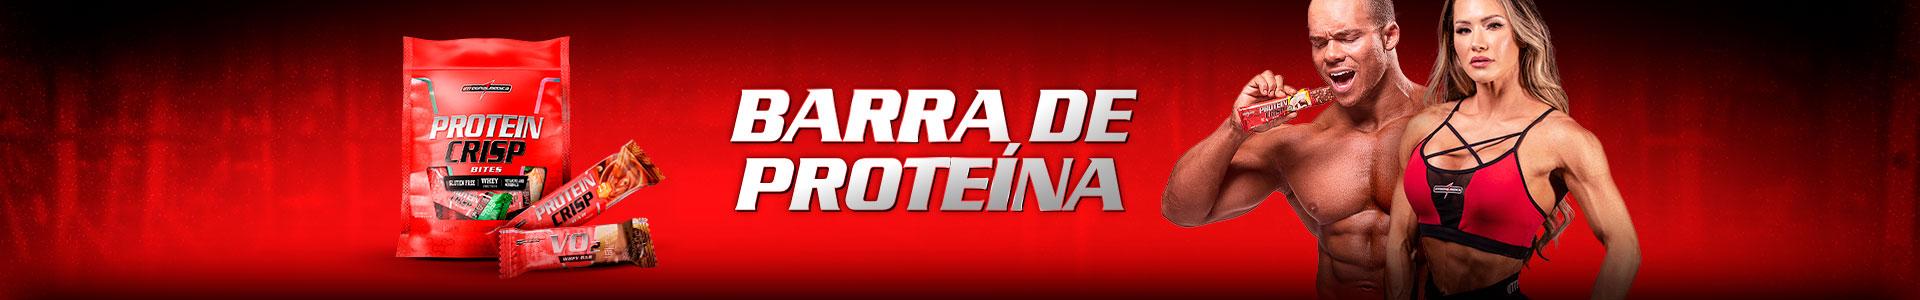 Banner - Barra de Proteína - Desktop